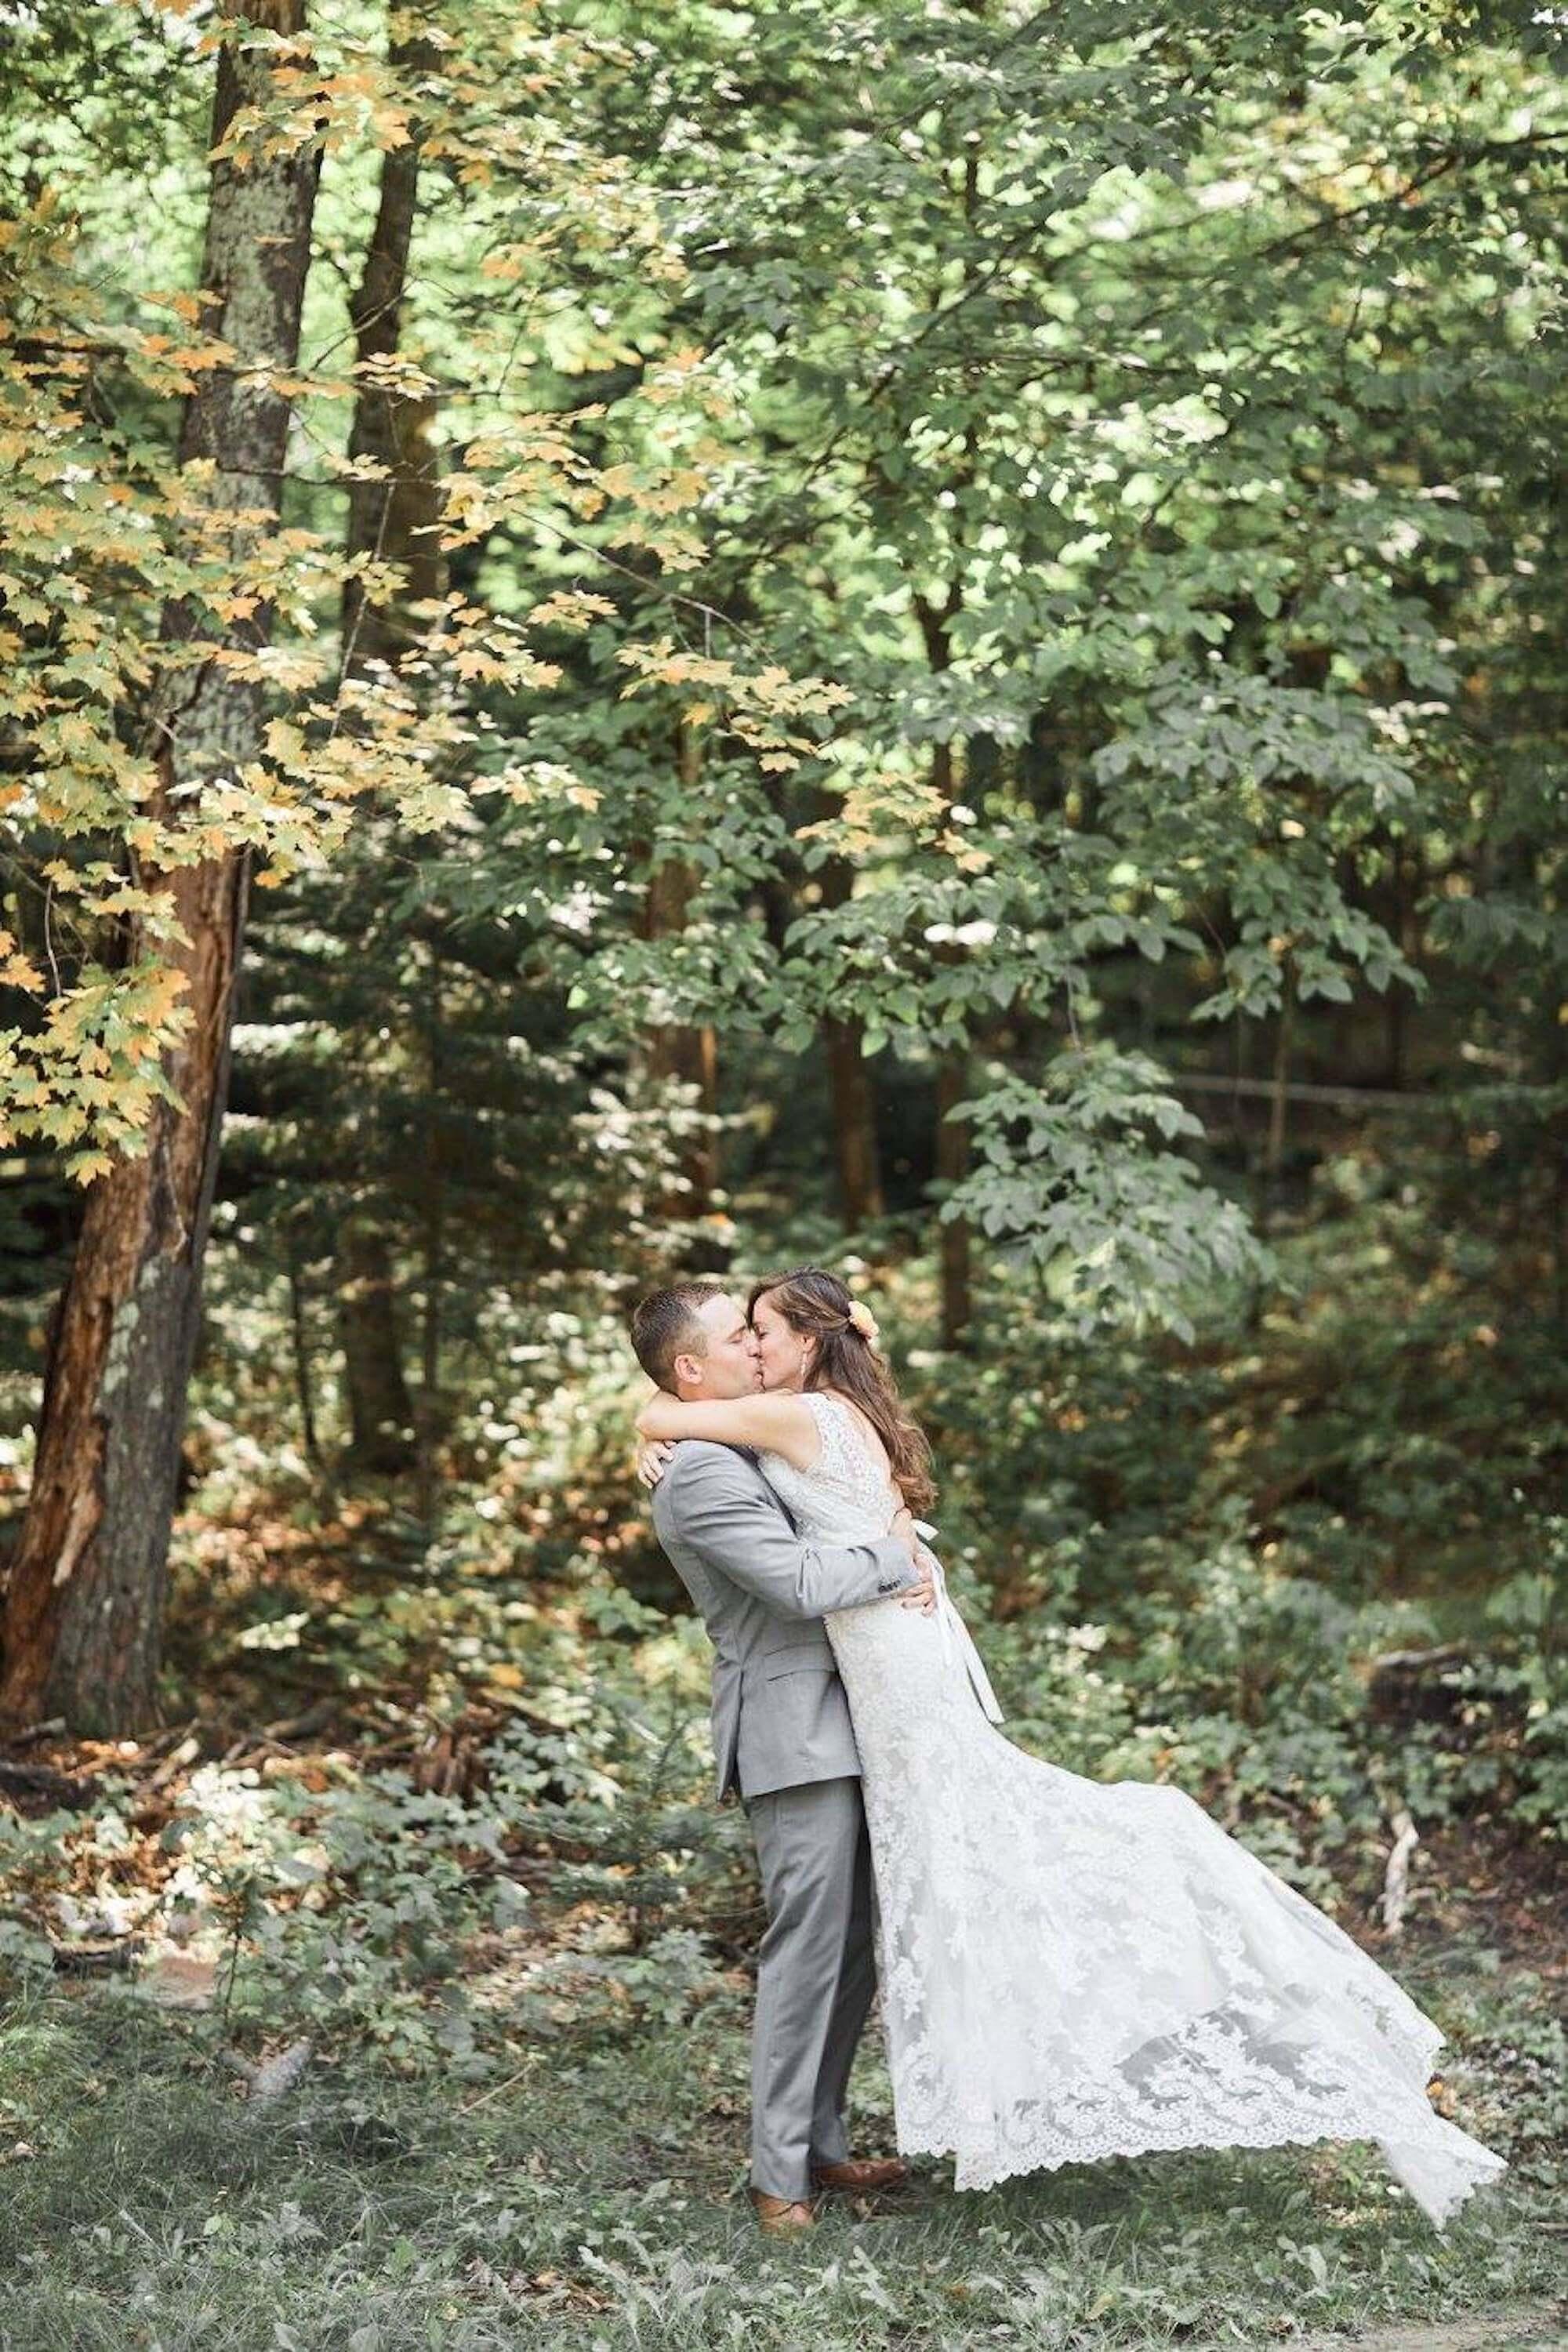 engle-olson-wedding-video-perry-james-photography-28.jpg